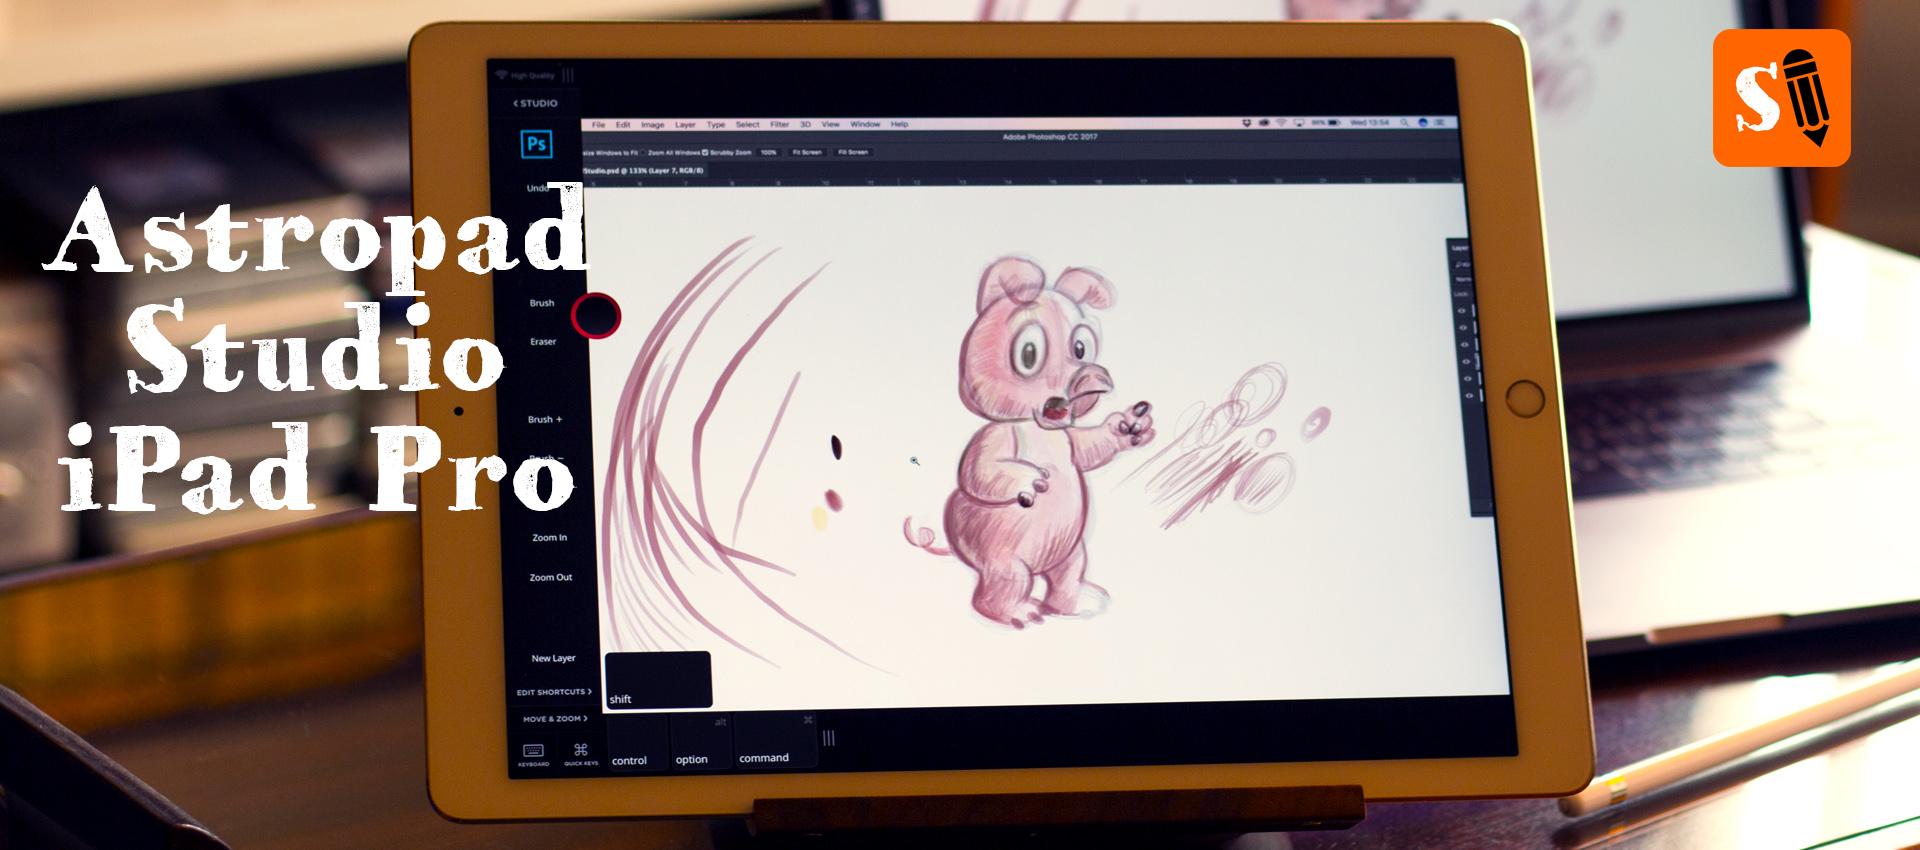 Astropad Studio